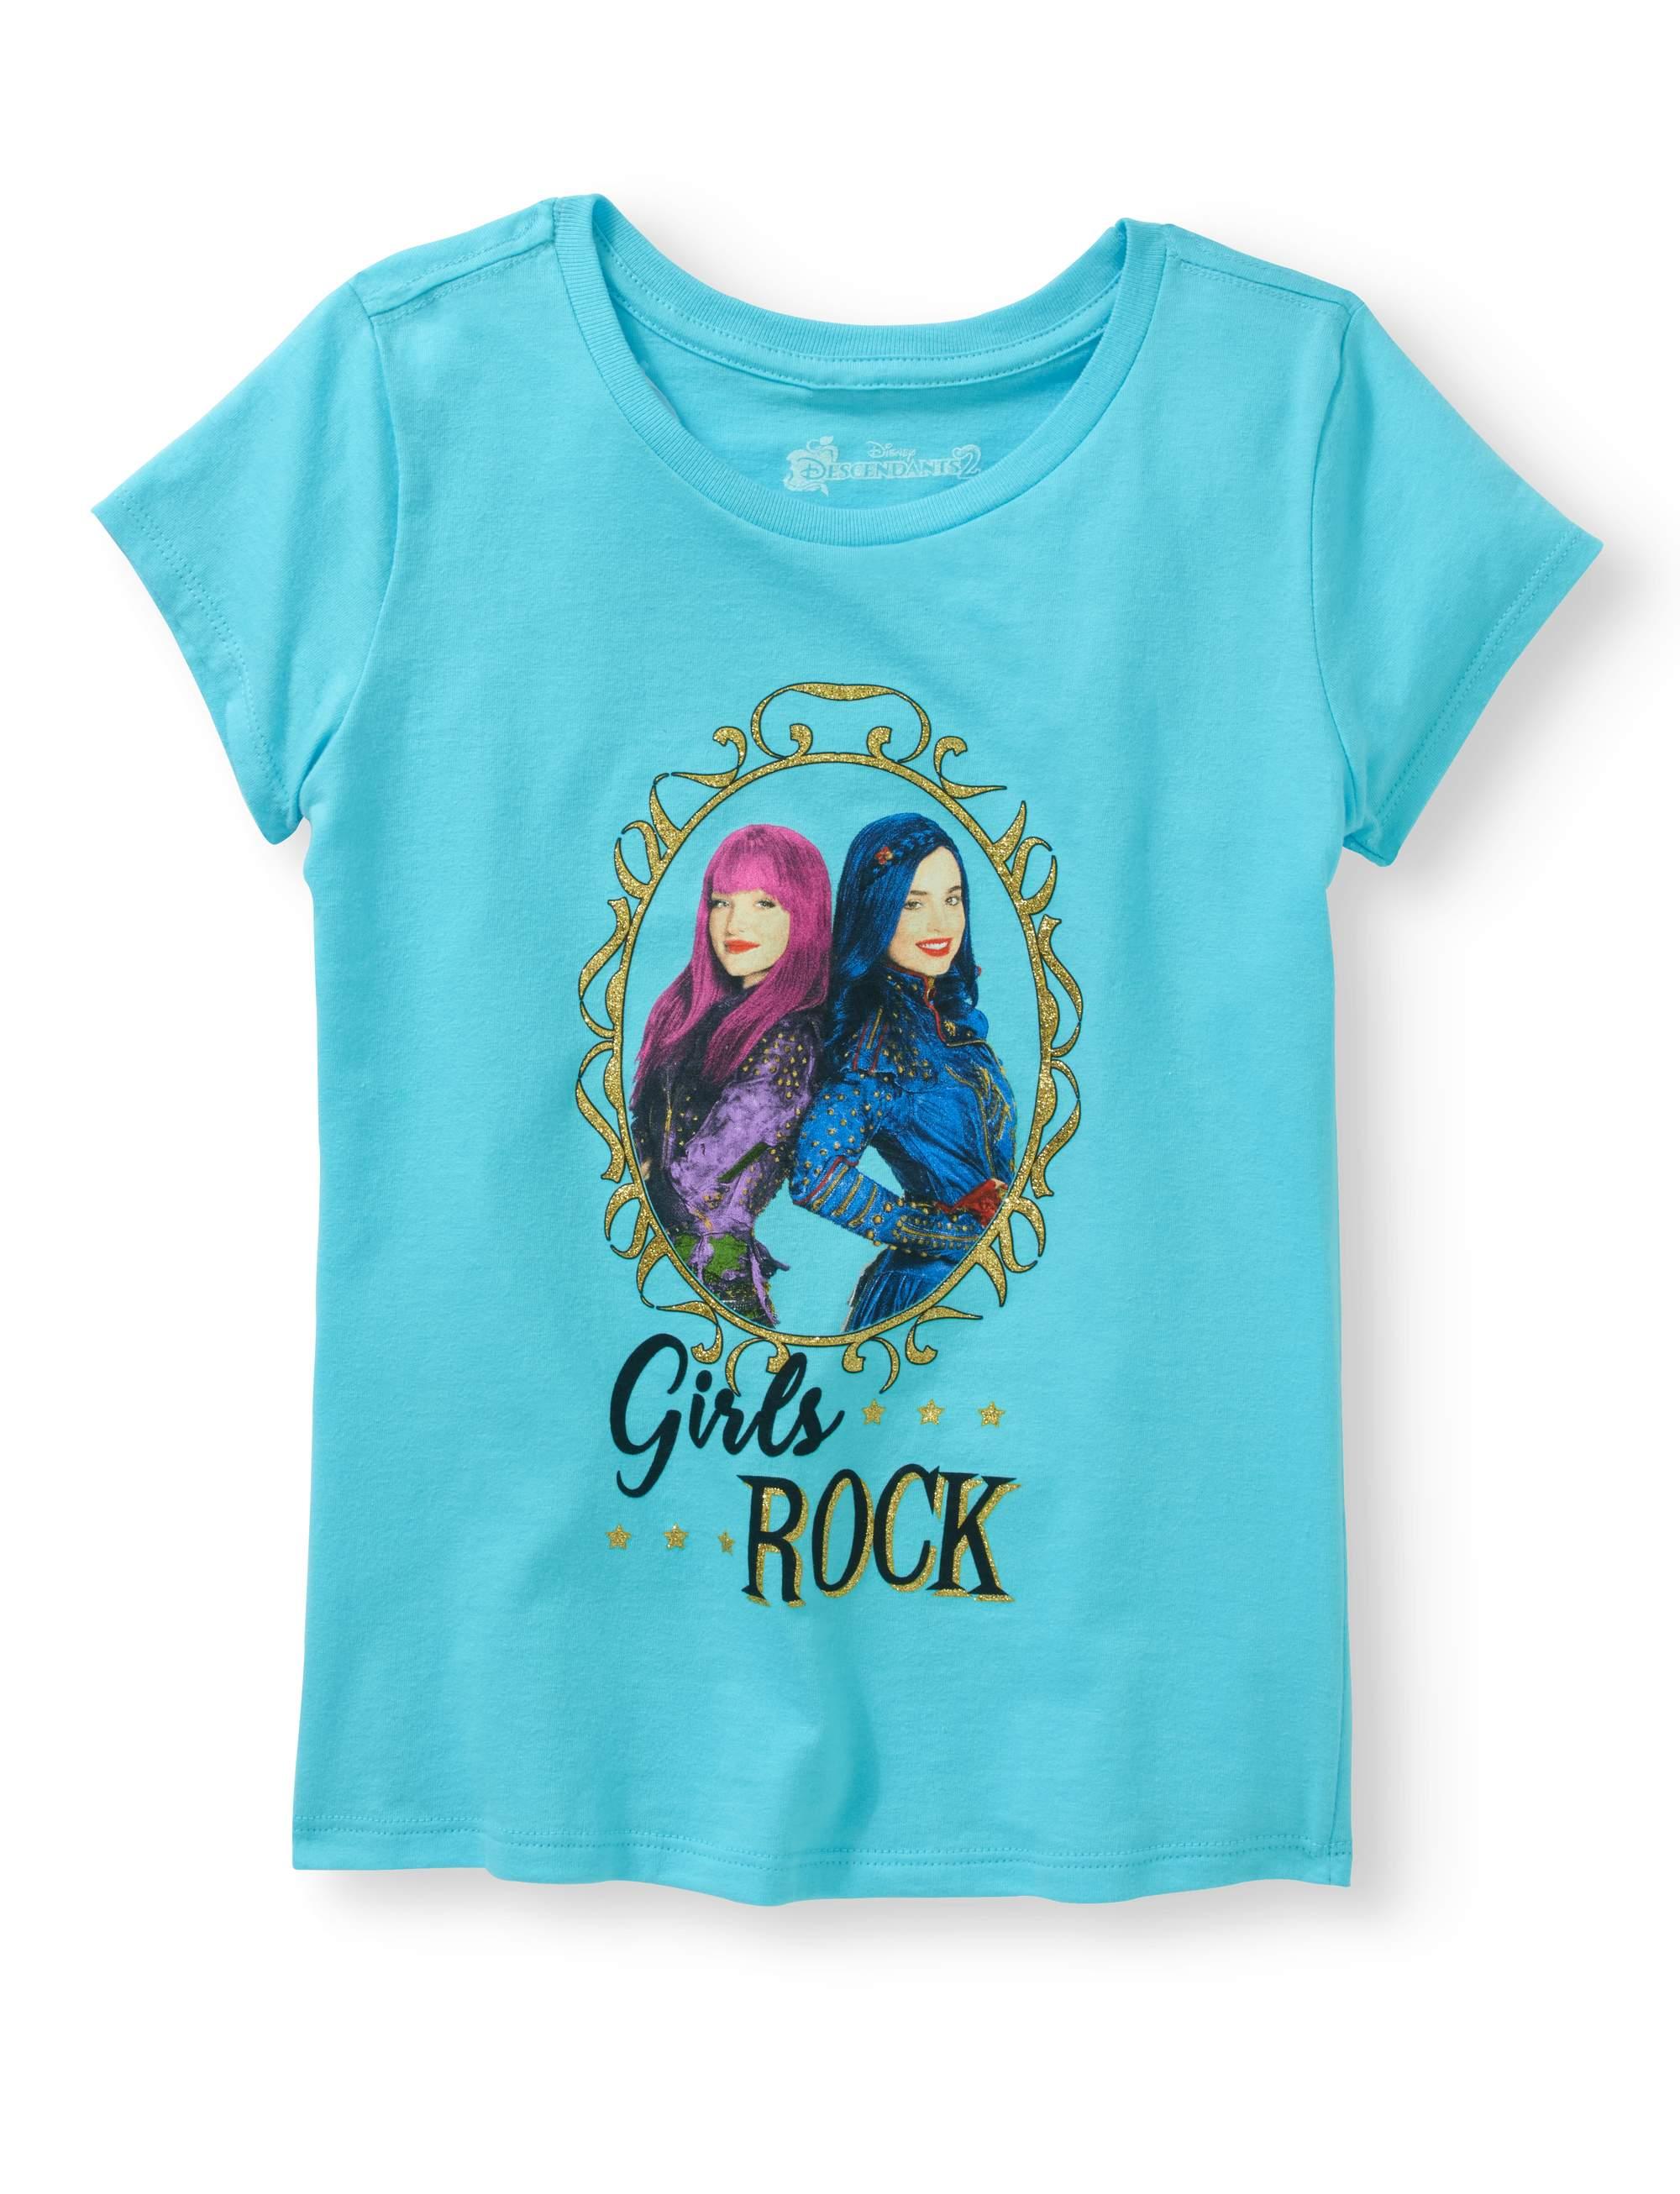 Girls Ss Folded Tee Shirt